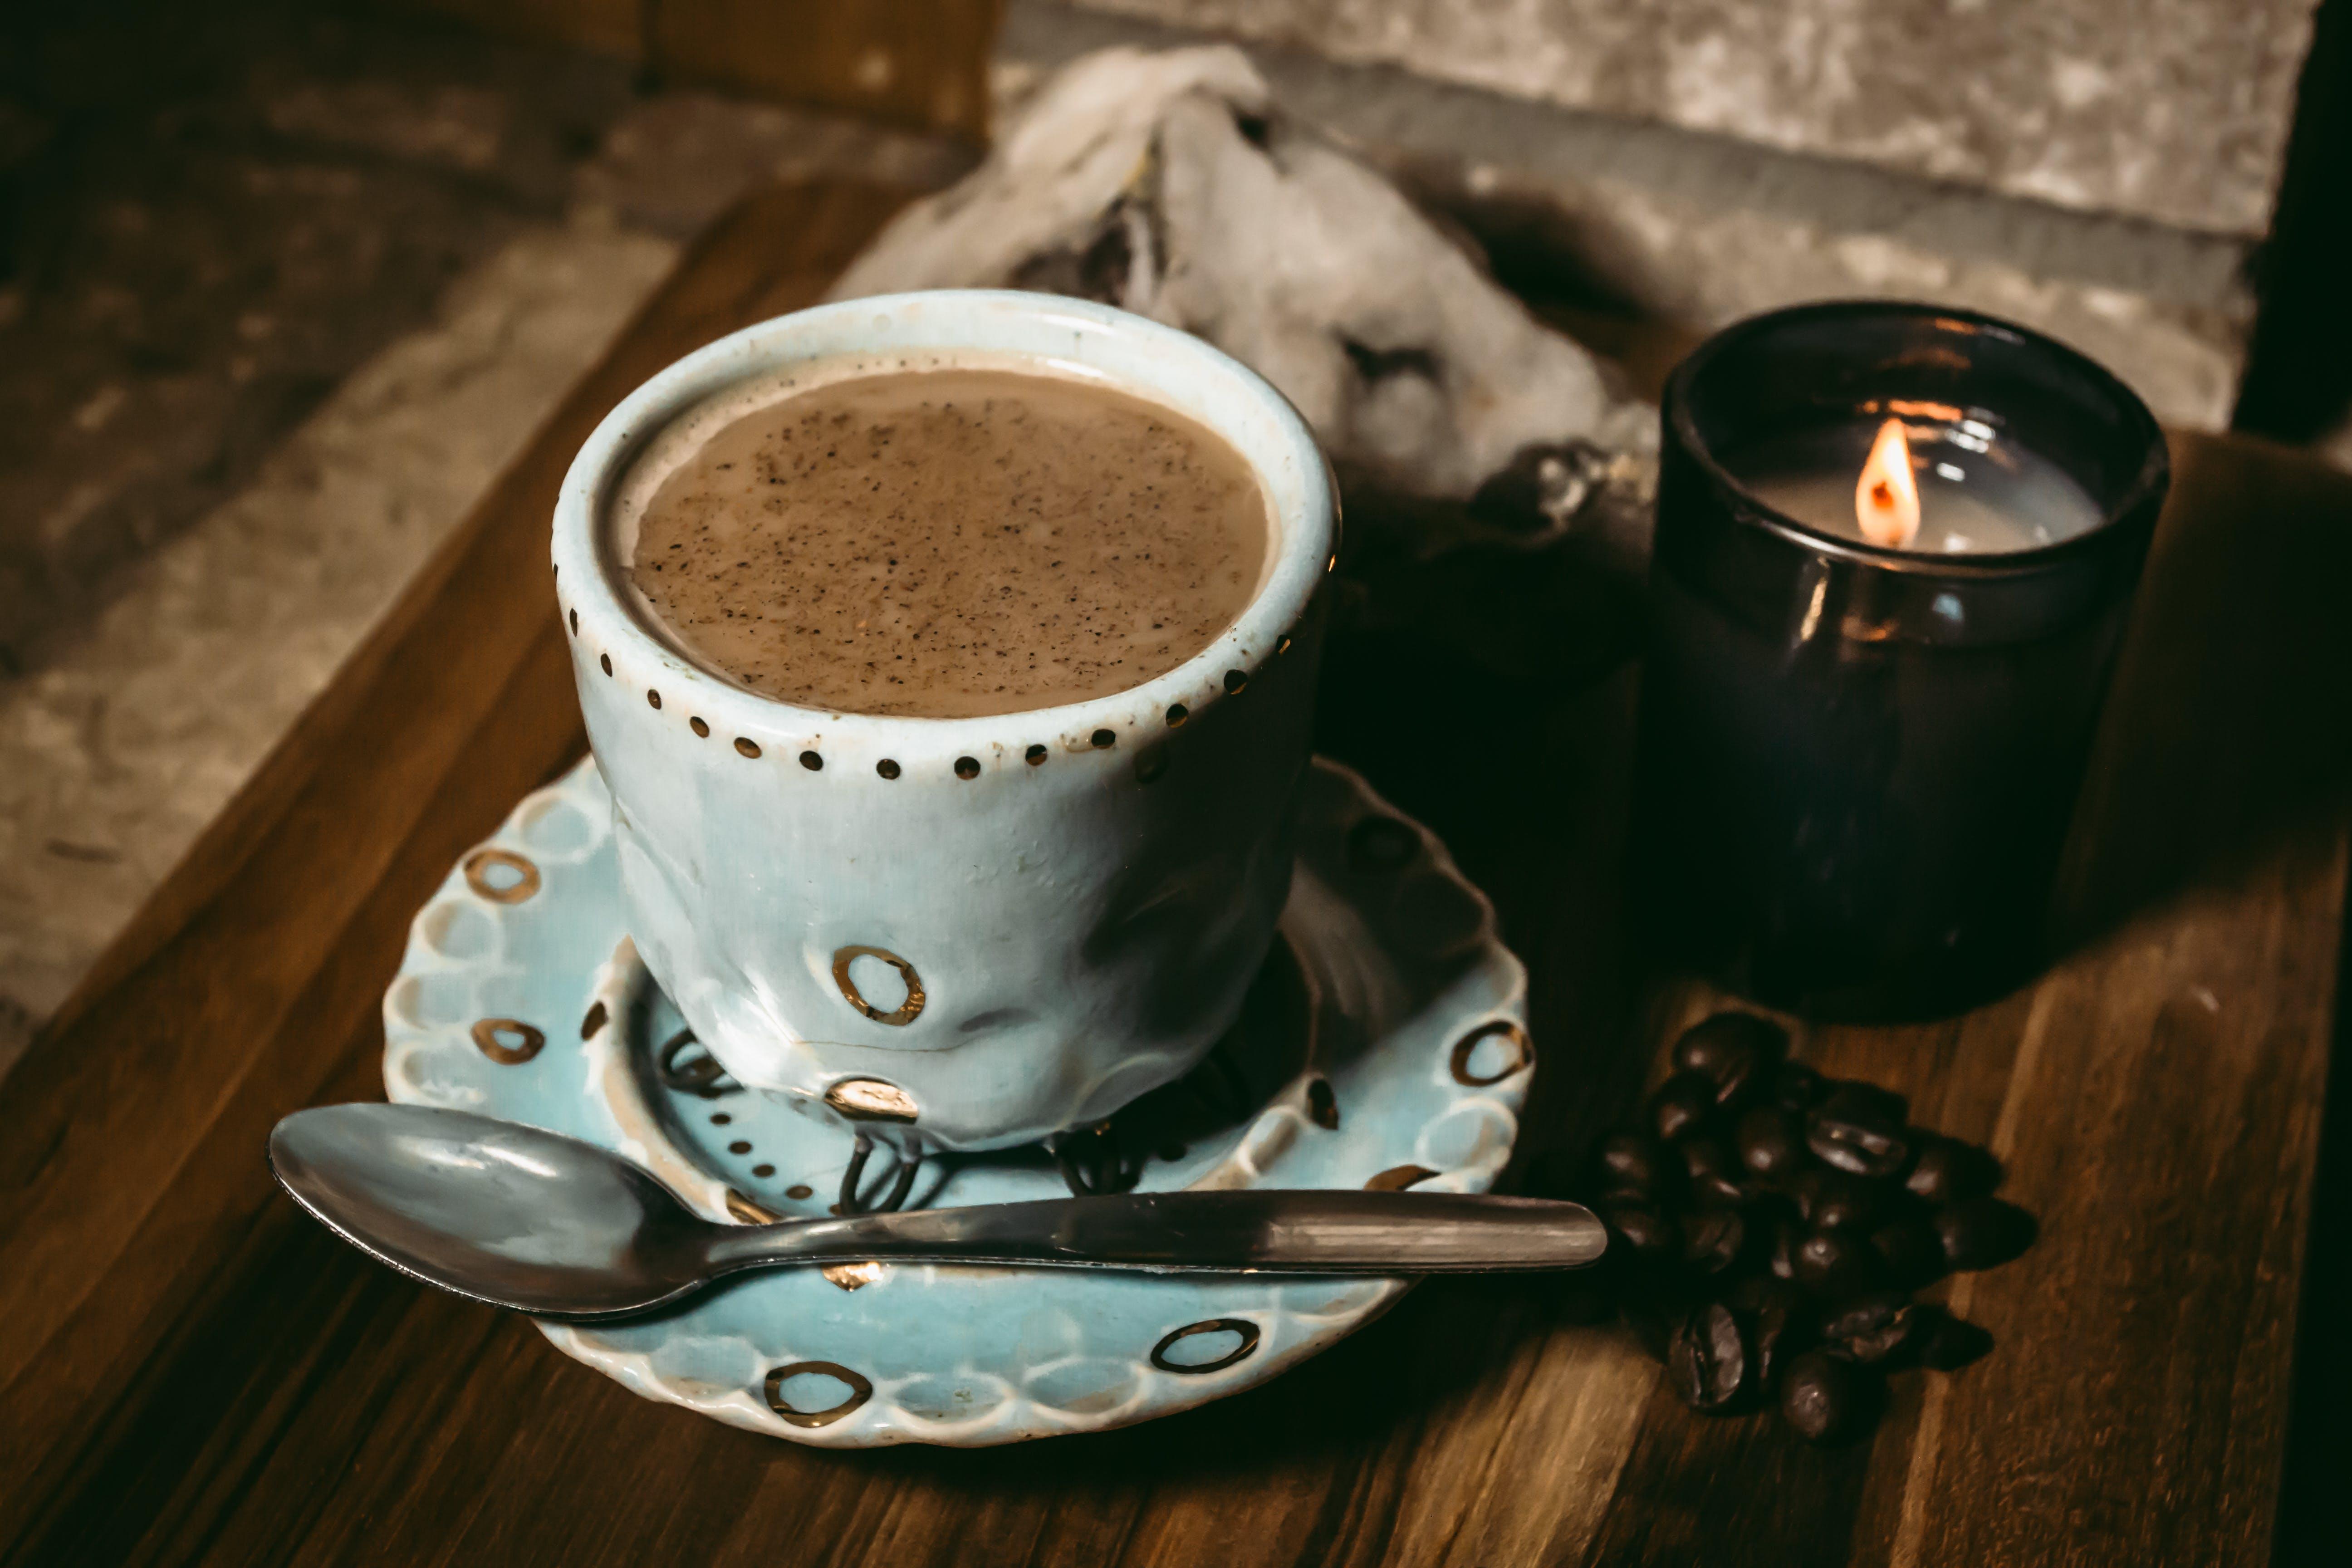 Hot Beverage in Ceramic Cup